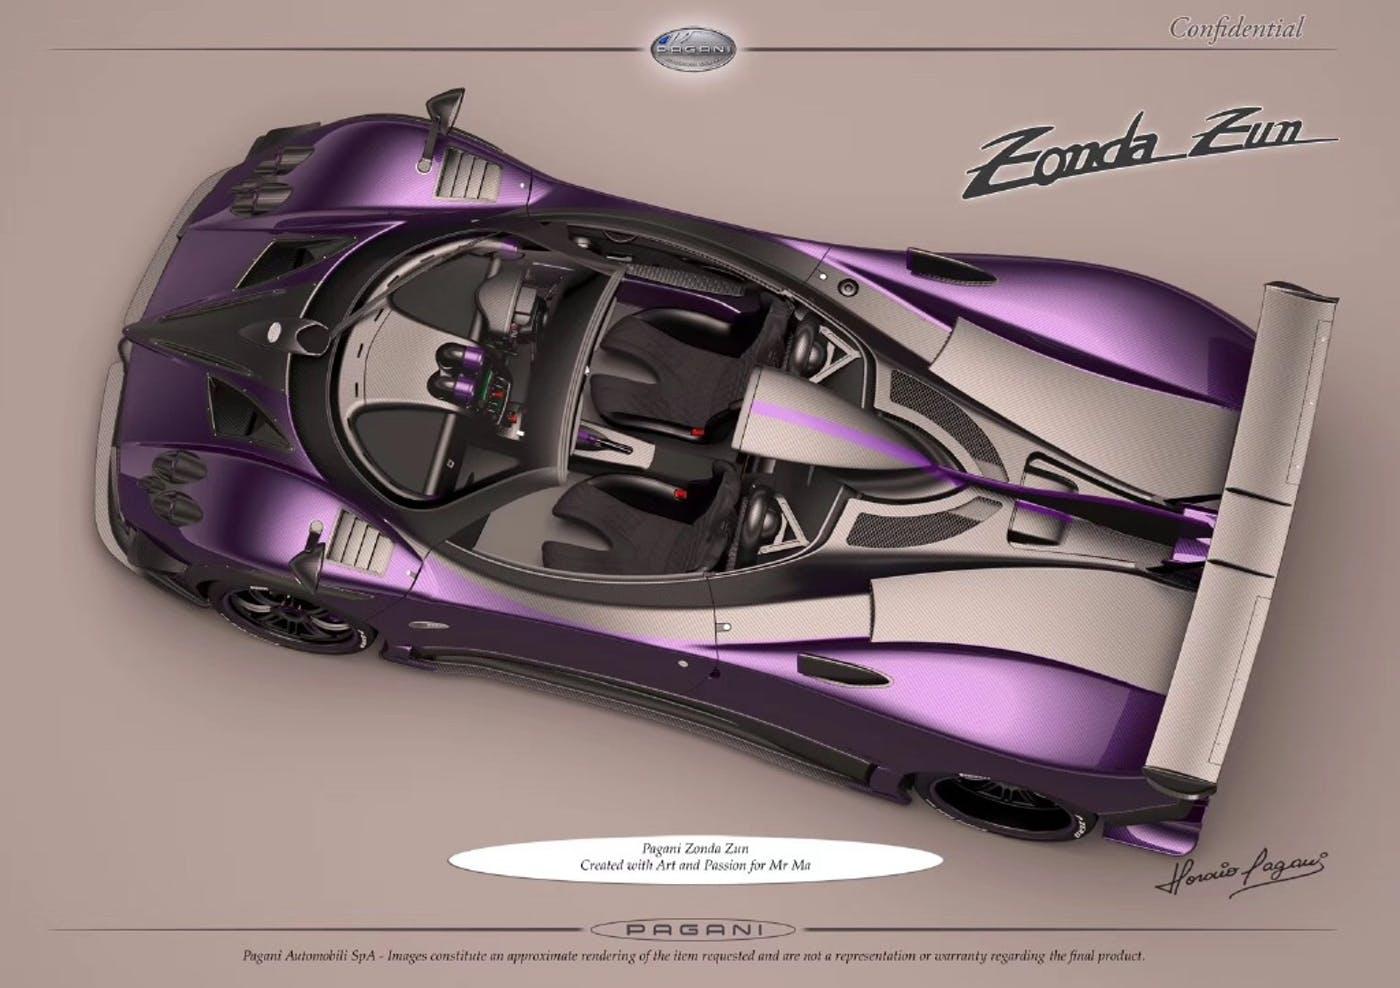 Pagani-Ζonda-Zun-4